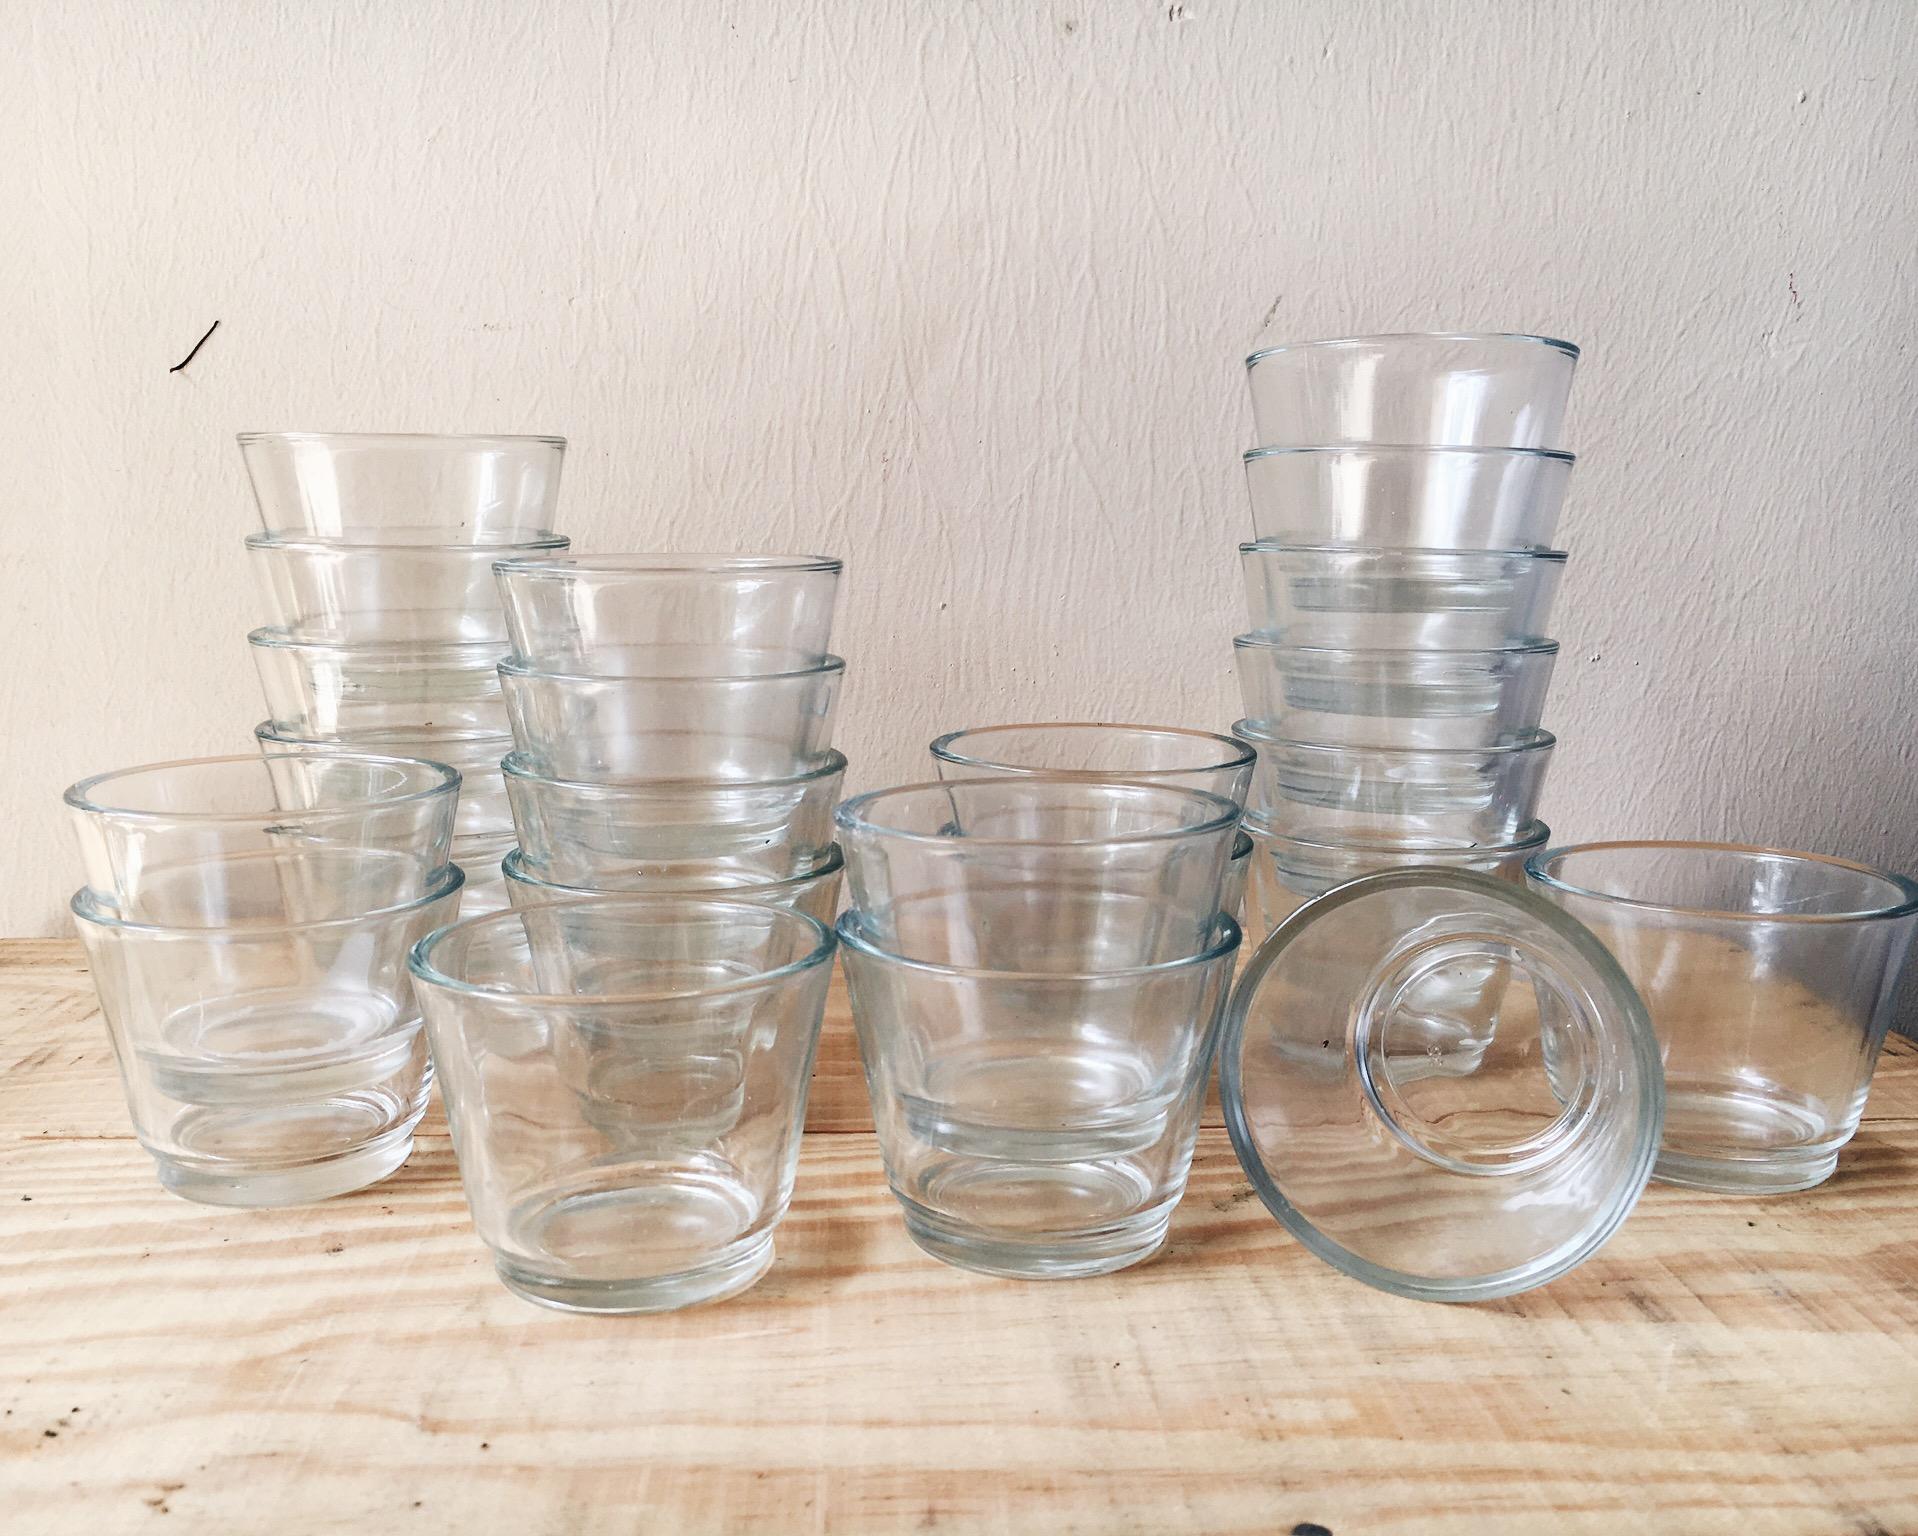 glassware tealight holders 2.JPG